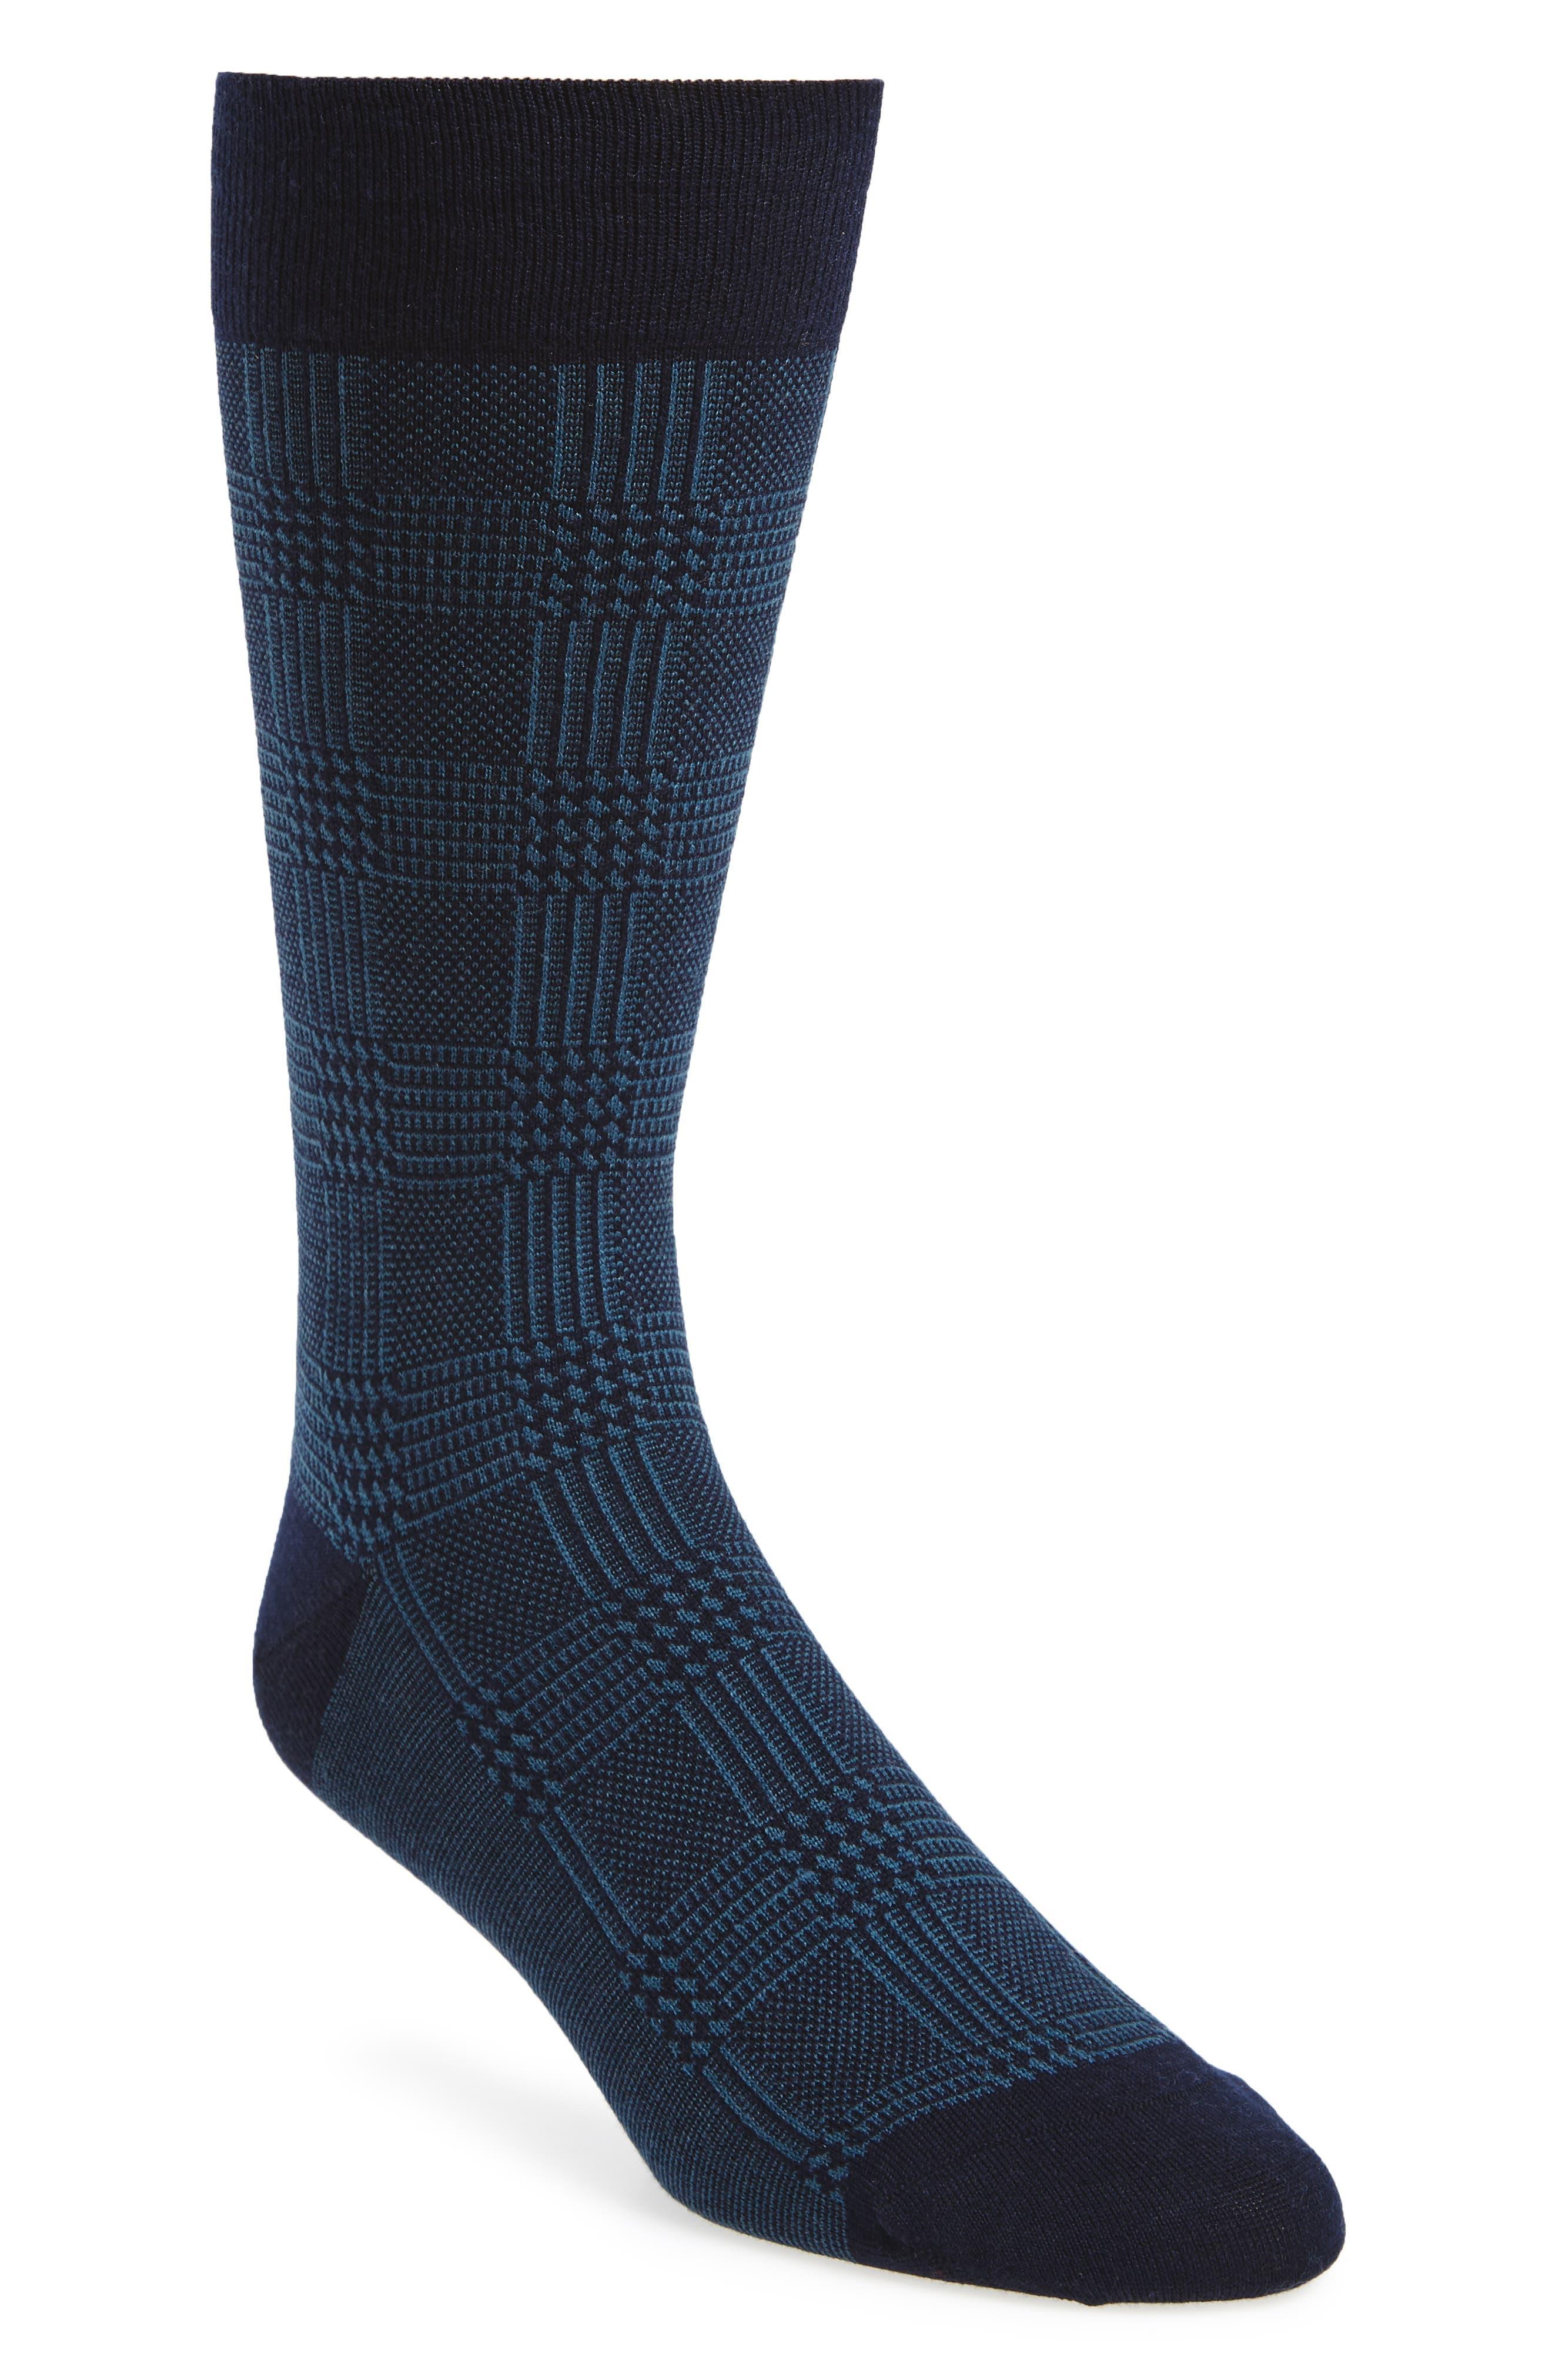 Plaid Wool Blend Socks,                             Main thumbnail 1, color,                             410